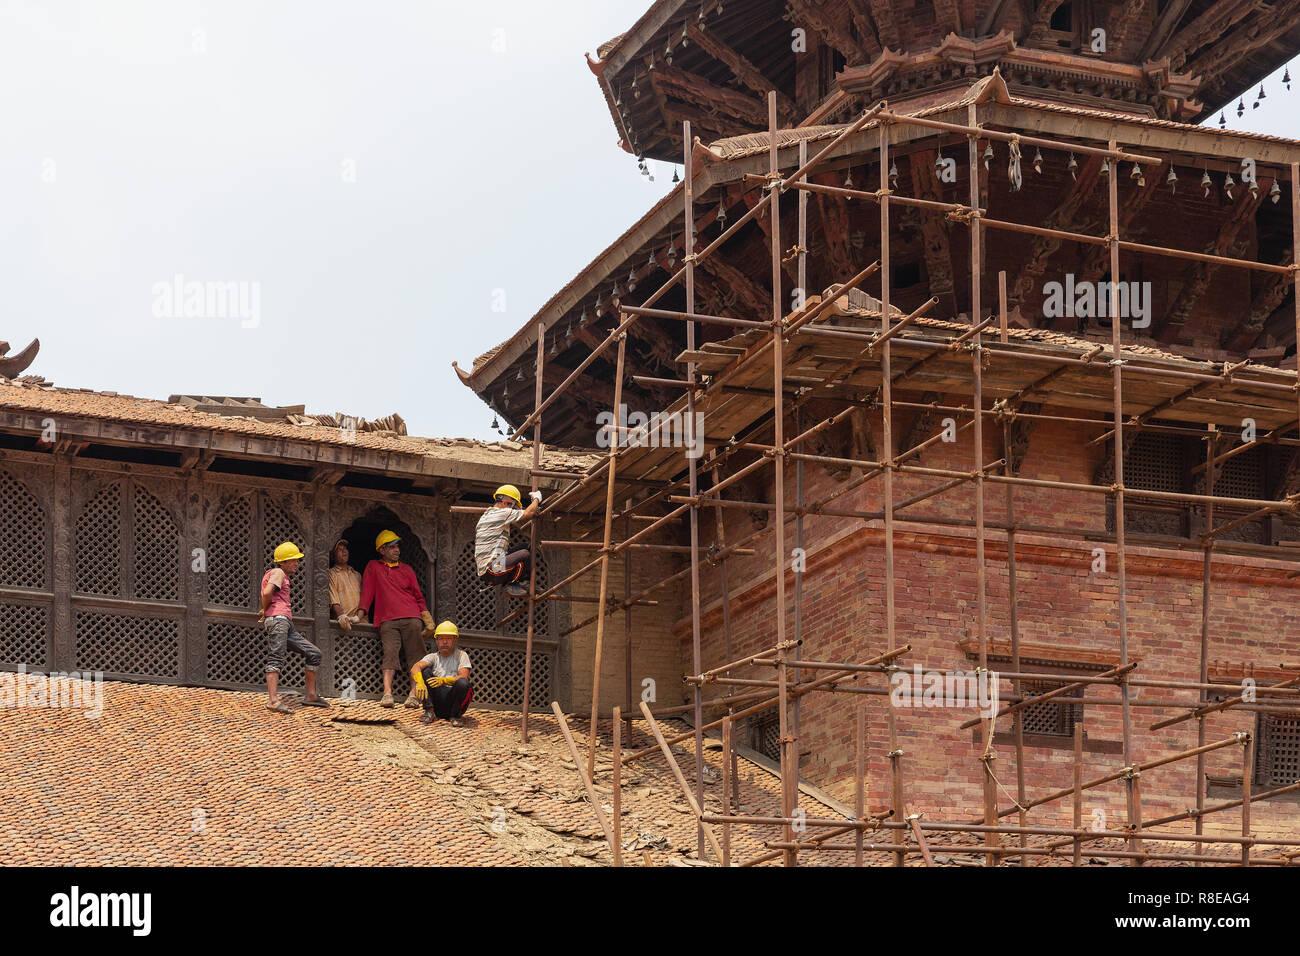 Construction scaffolding and building renovation of earthquake damage at  Hanuman Dhoka Palace Complex in Patan, Lalitpur, Nepal. Stock Photo